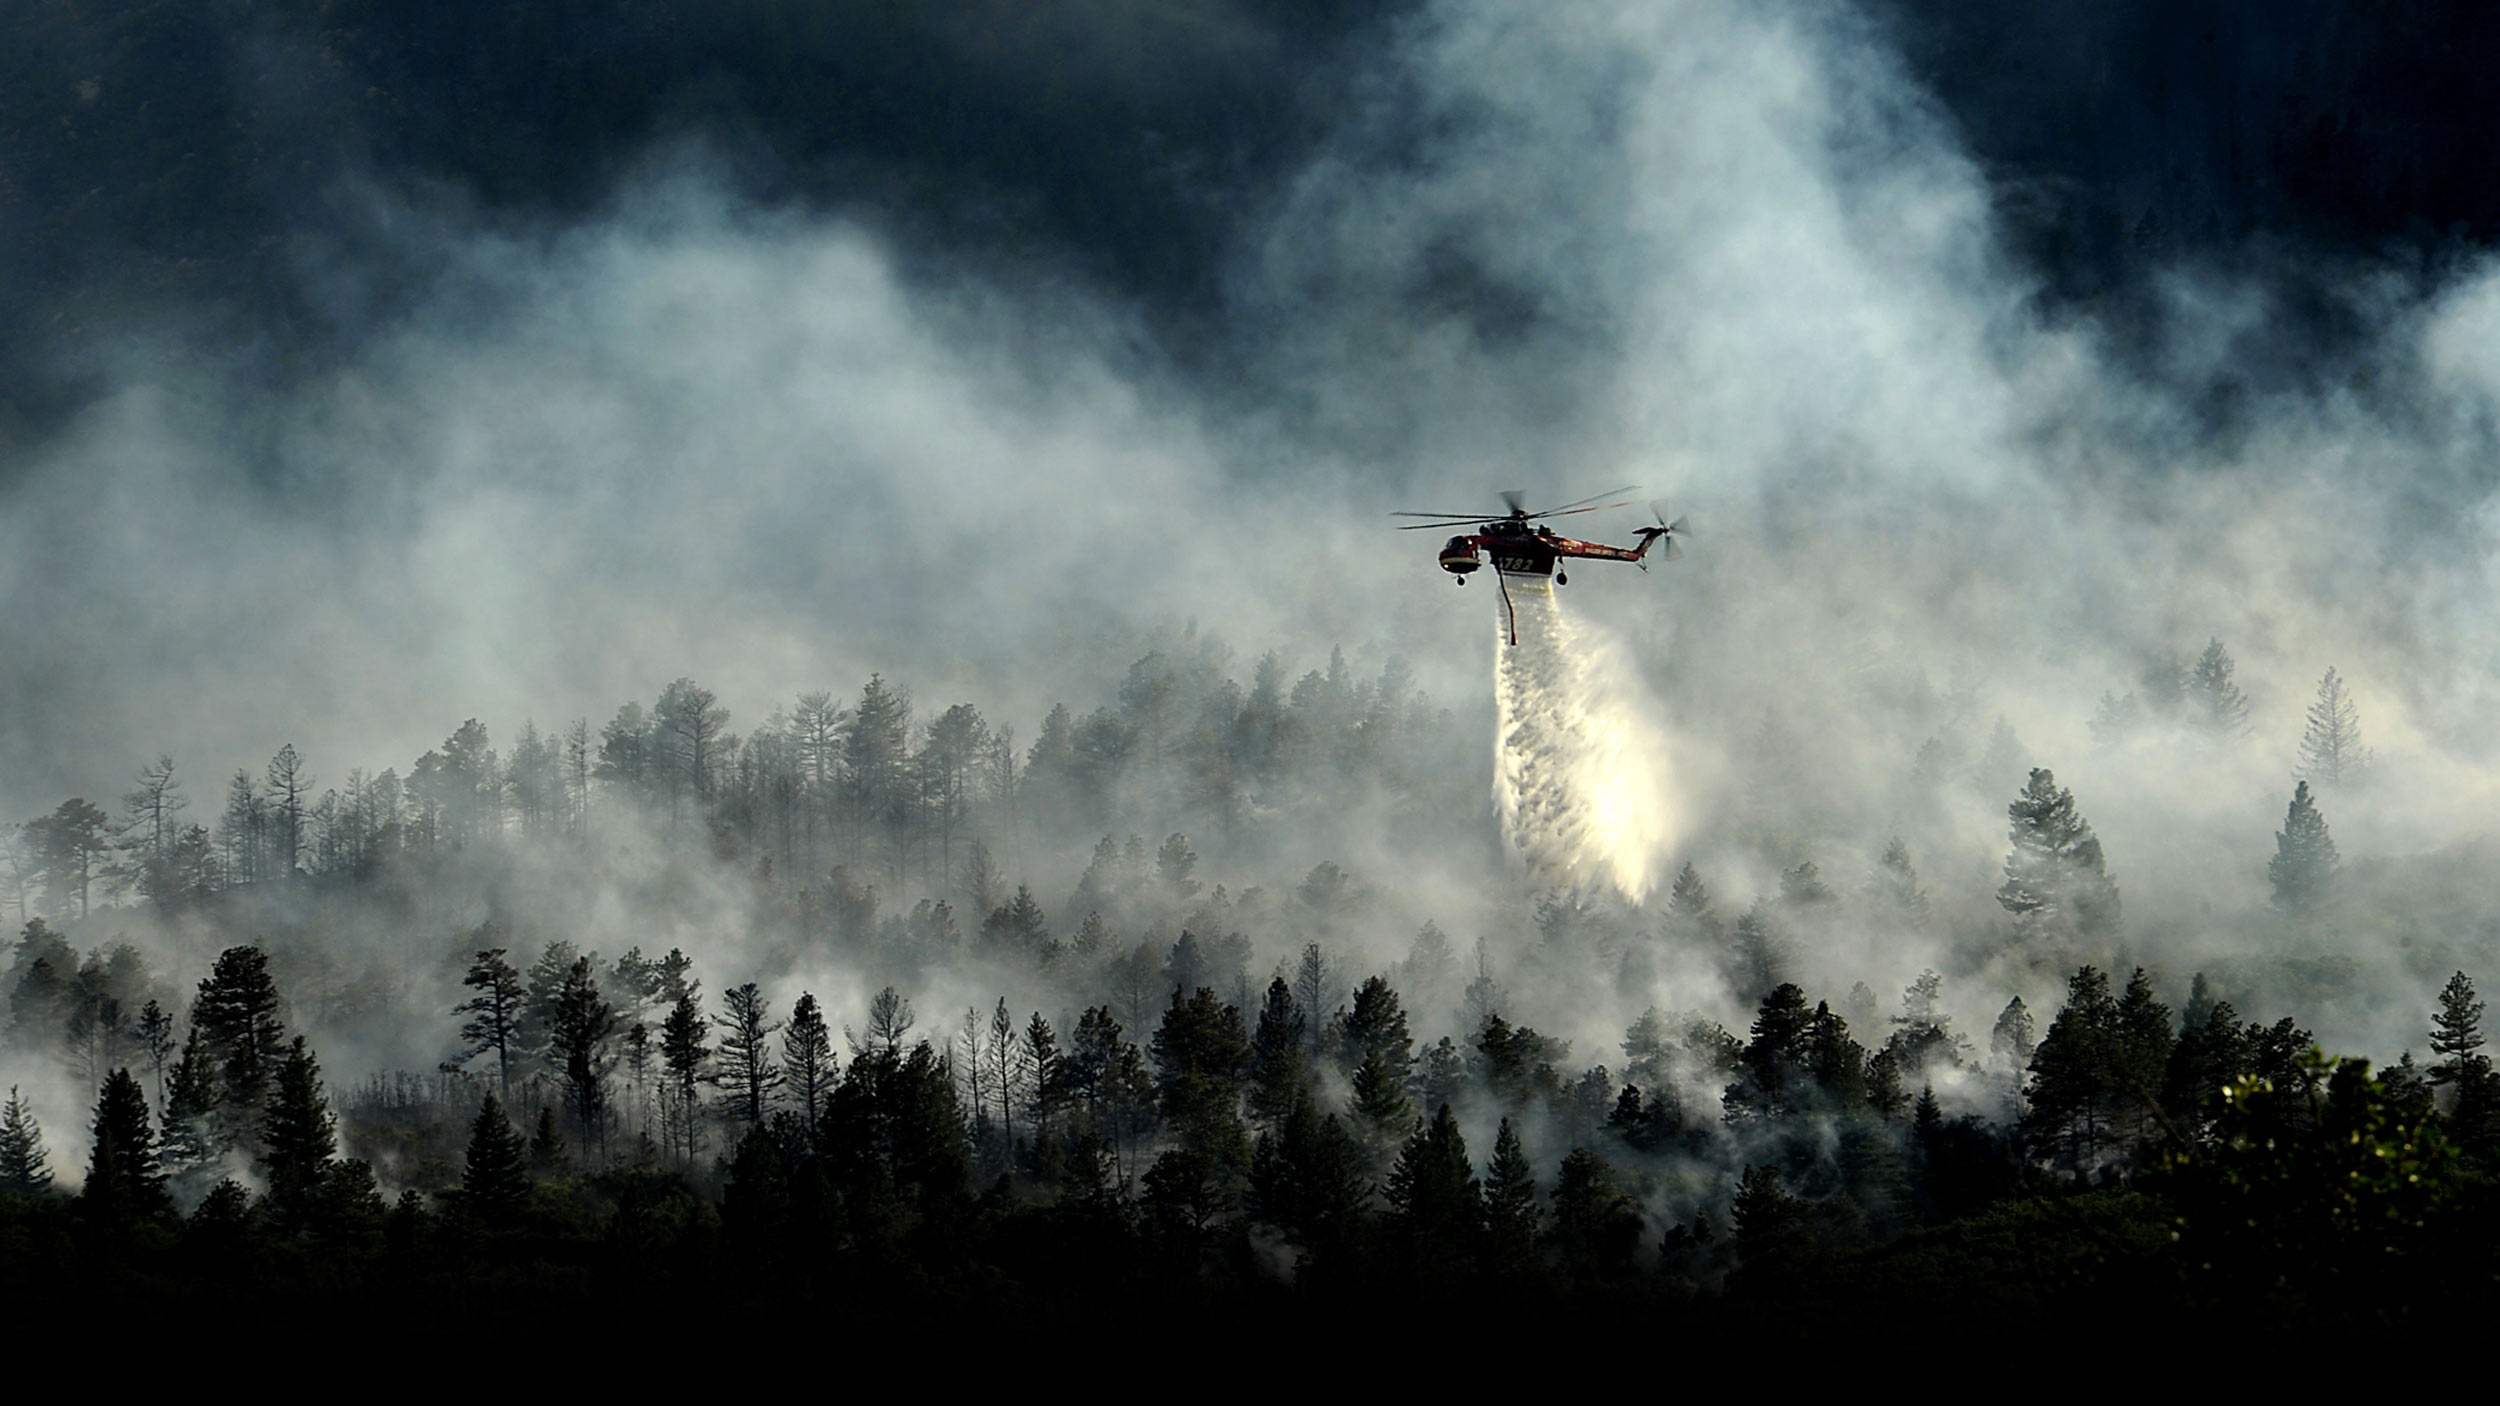 Cornea-Website-Images-Chopper-Fade.jpg